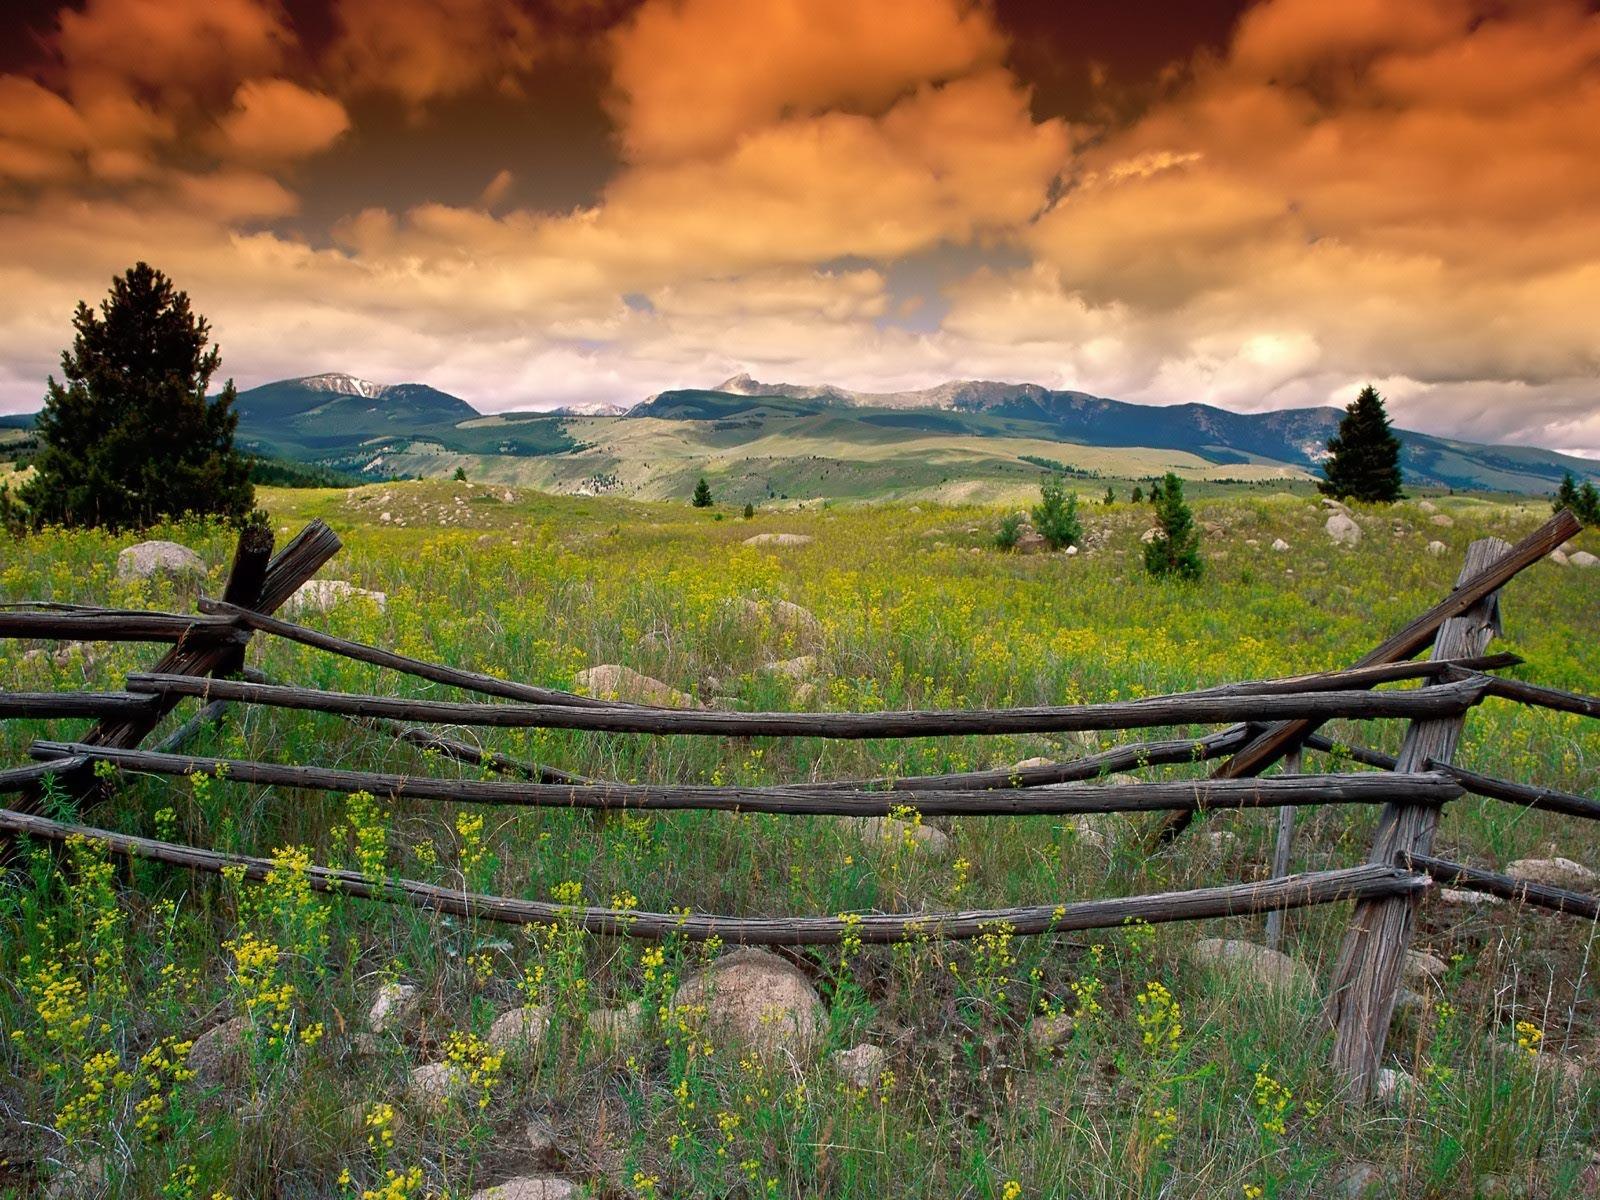 Amazing Montana Mountain Landscape 1600 x 1200 438 kB jpeg 1600x1200